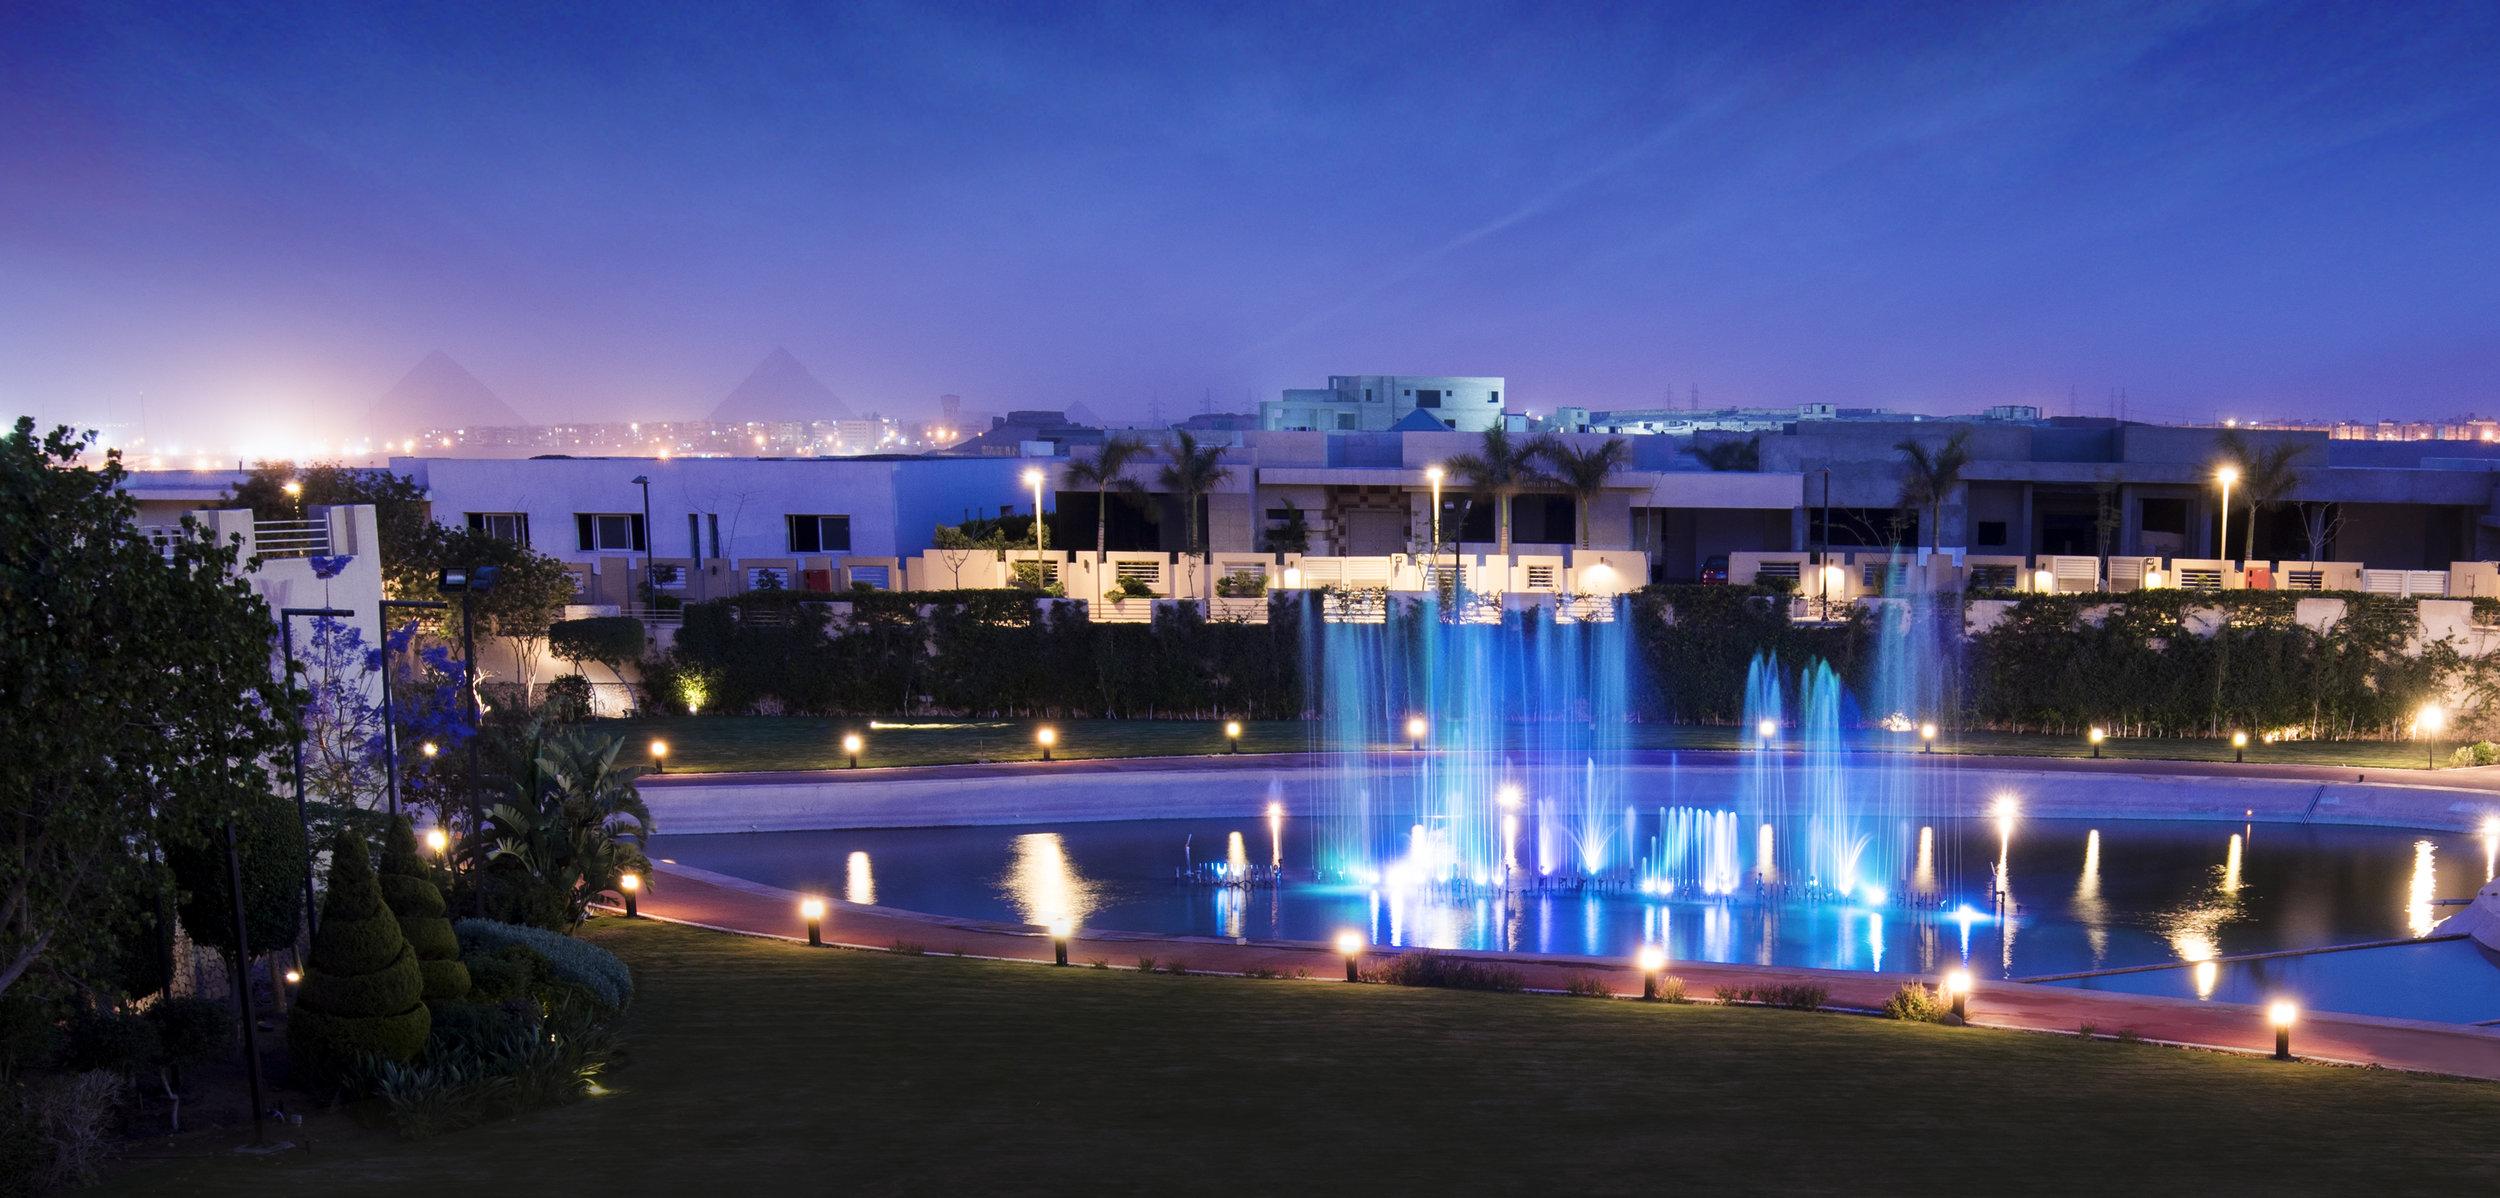 Central Fountain night.jpg